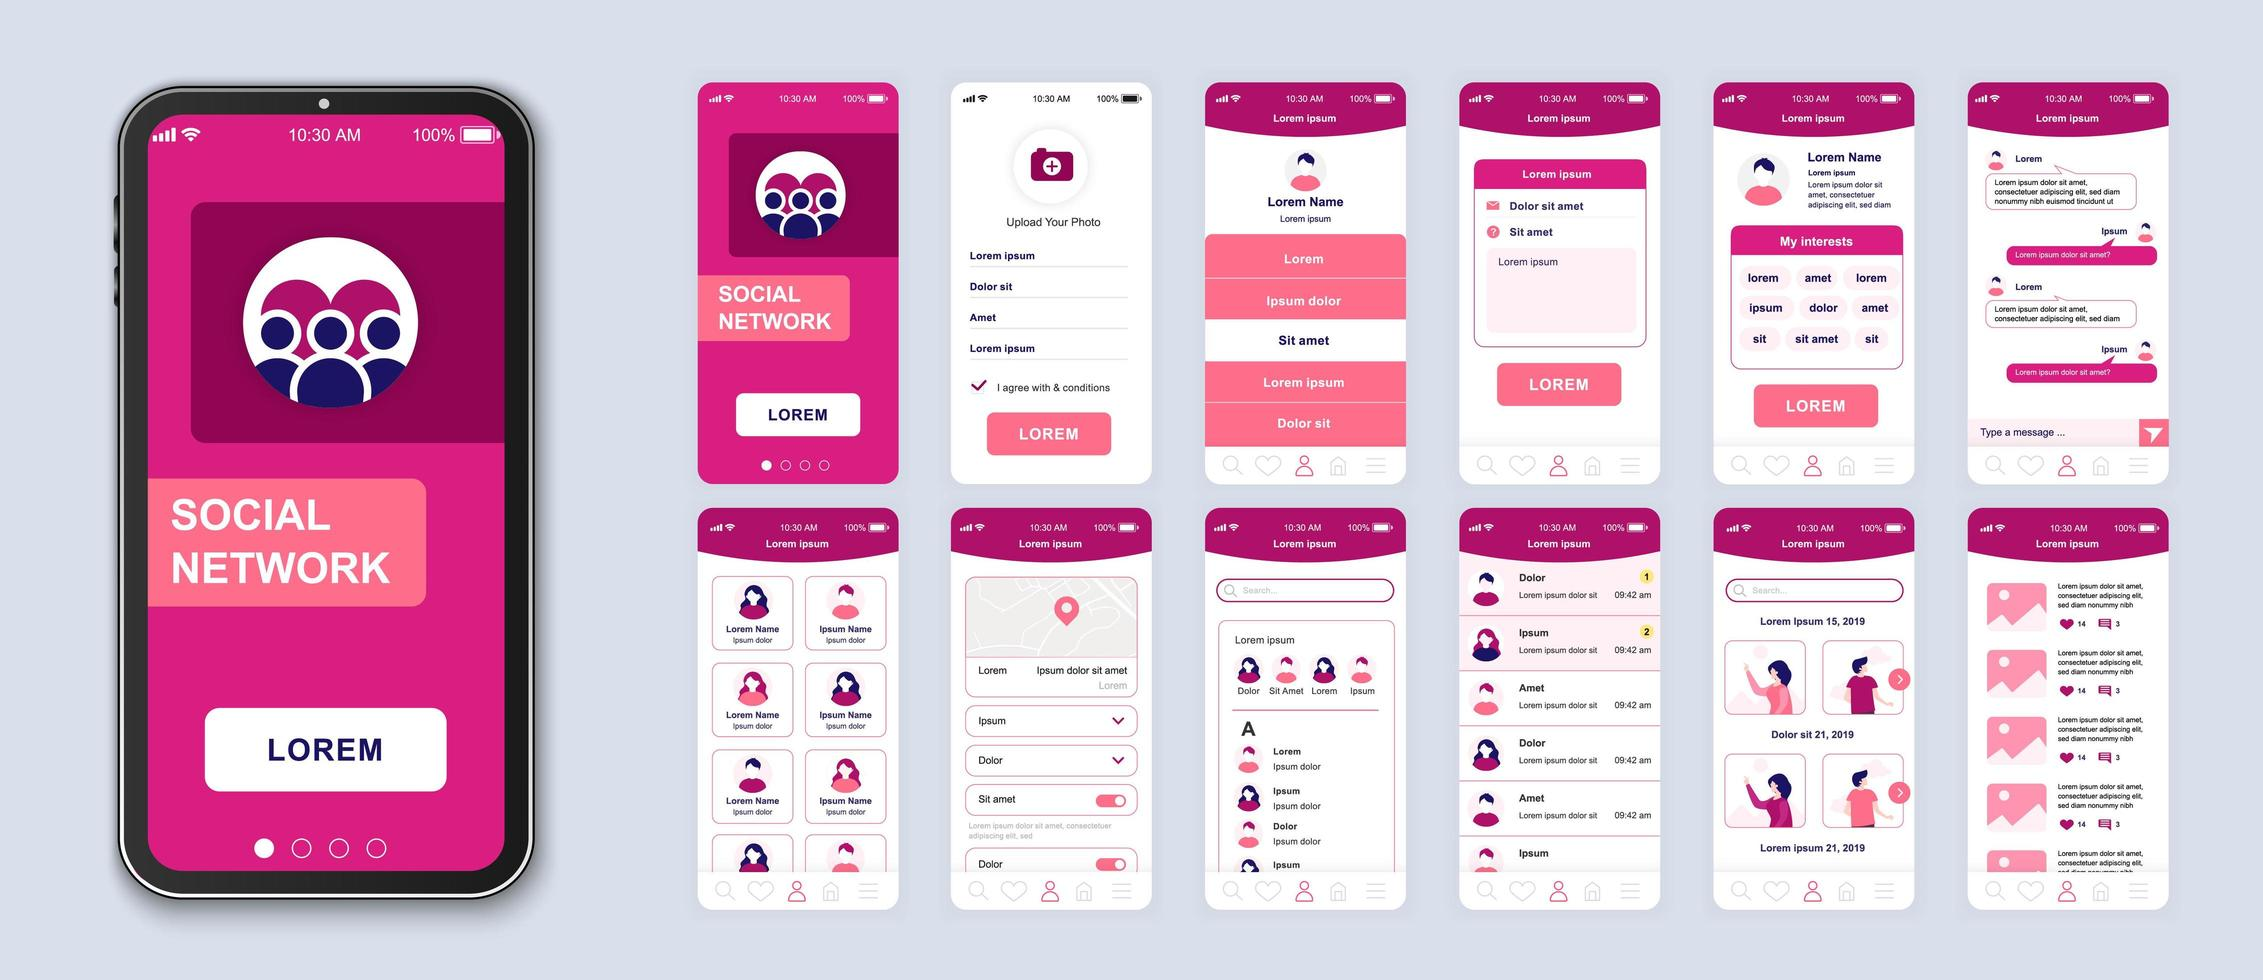 interface de smartphone ui de rede social rosa vetor